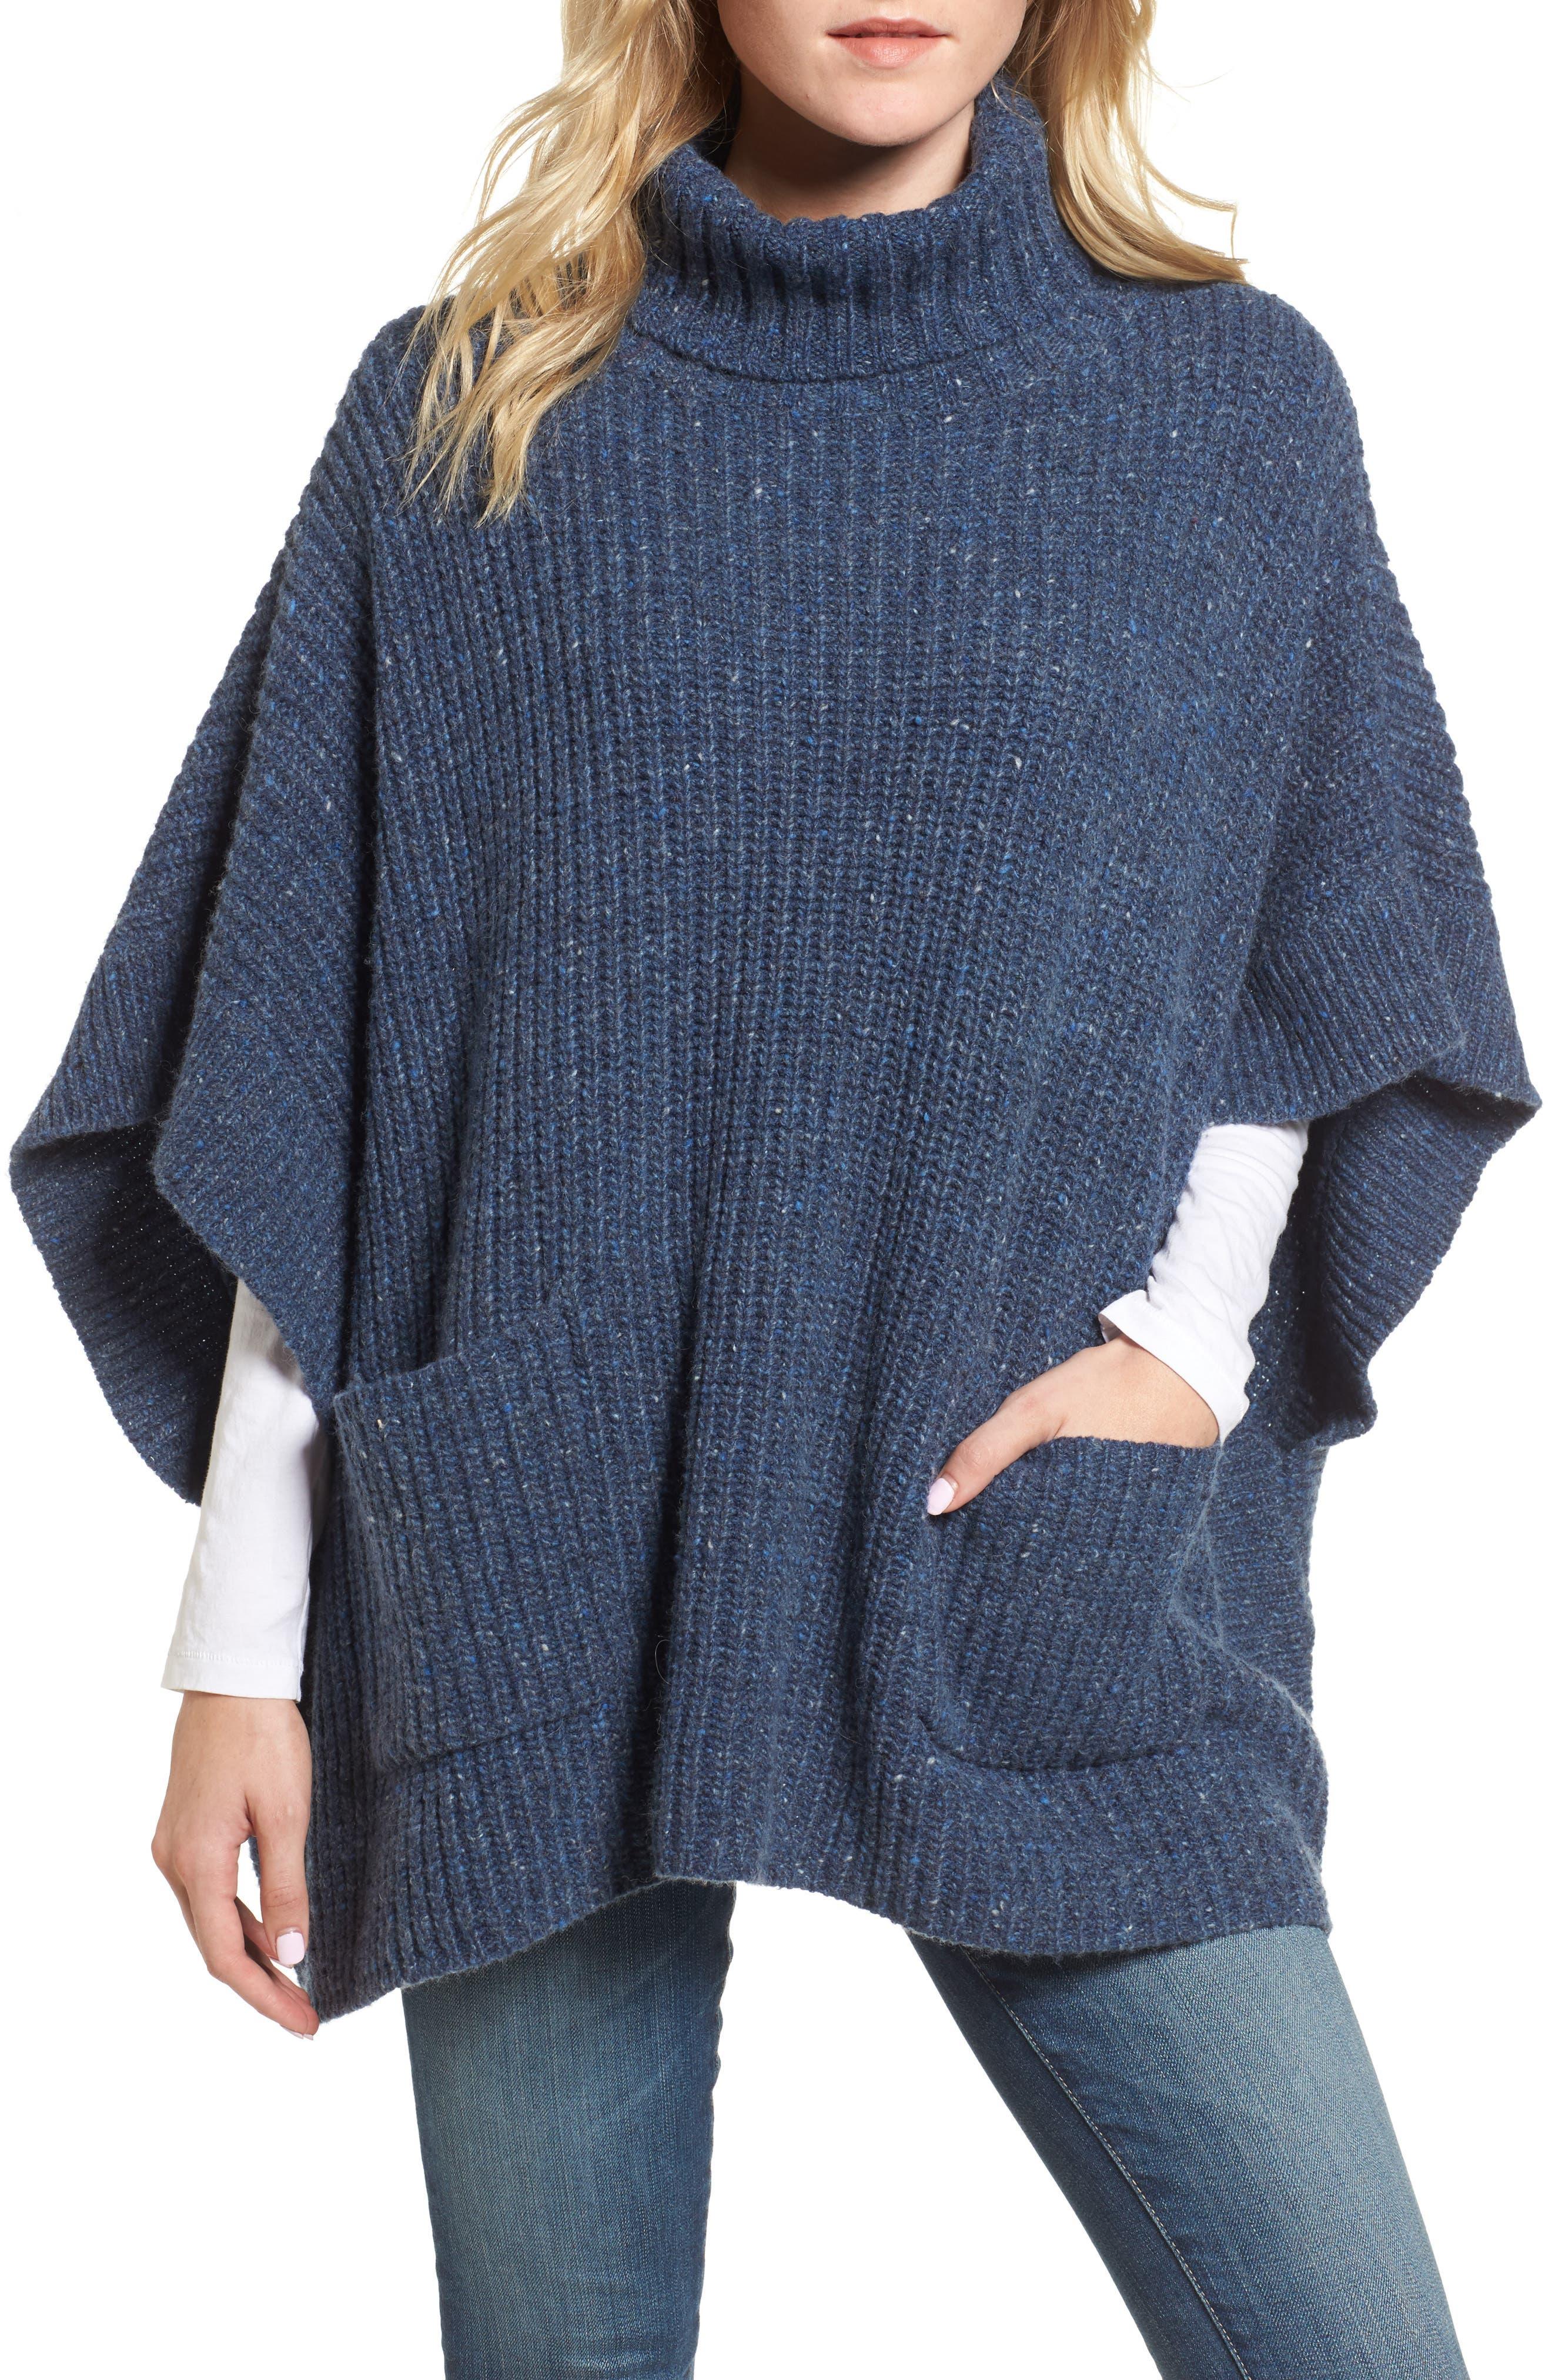 Serina Oversize Sweater,                         Main,                         color, Mull Navy Multi